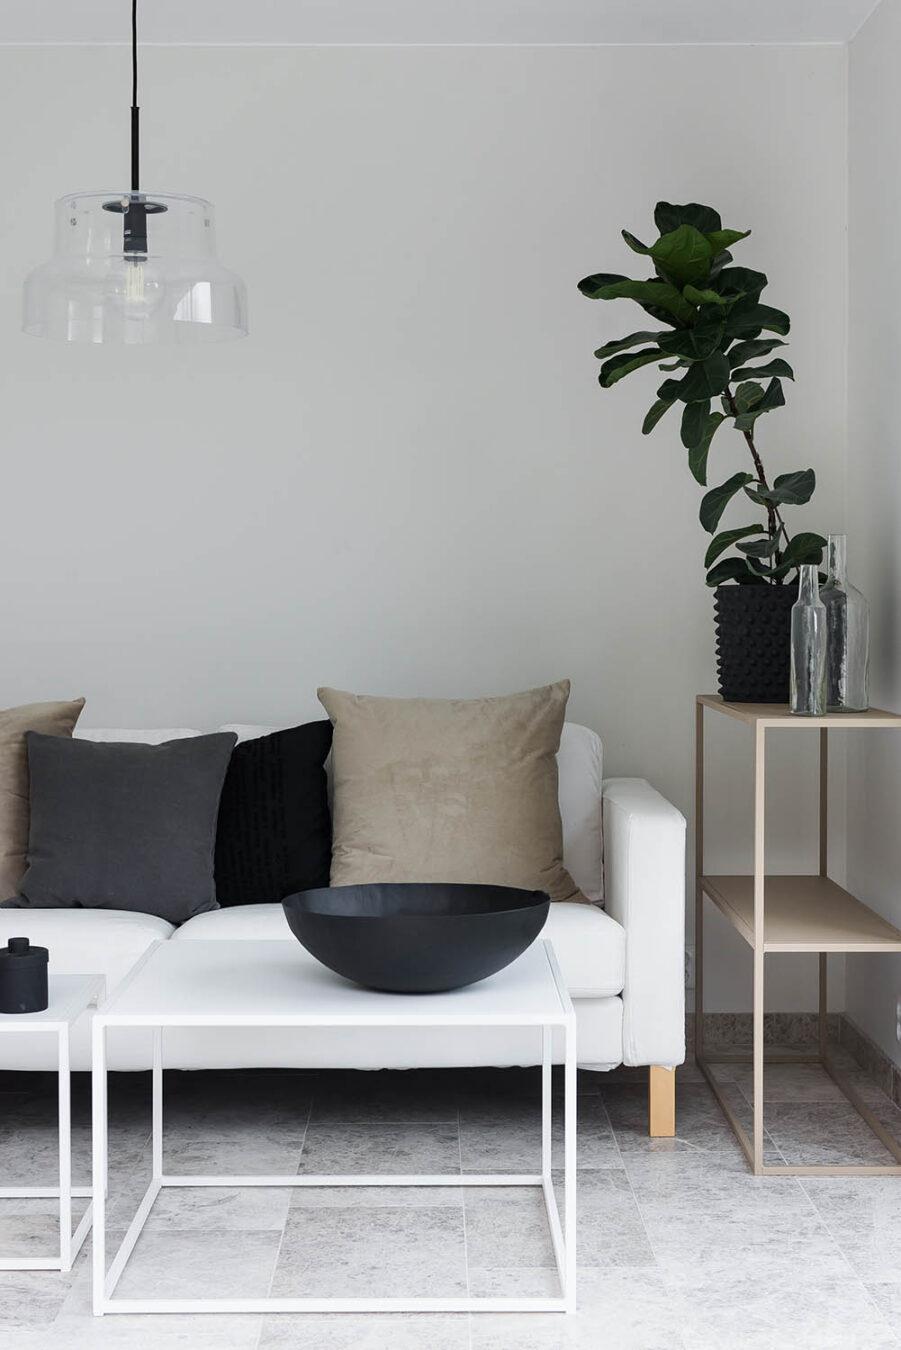 Miljöbild på Design Of soffbord i vitt.